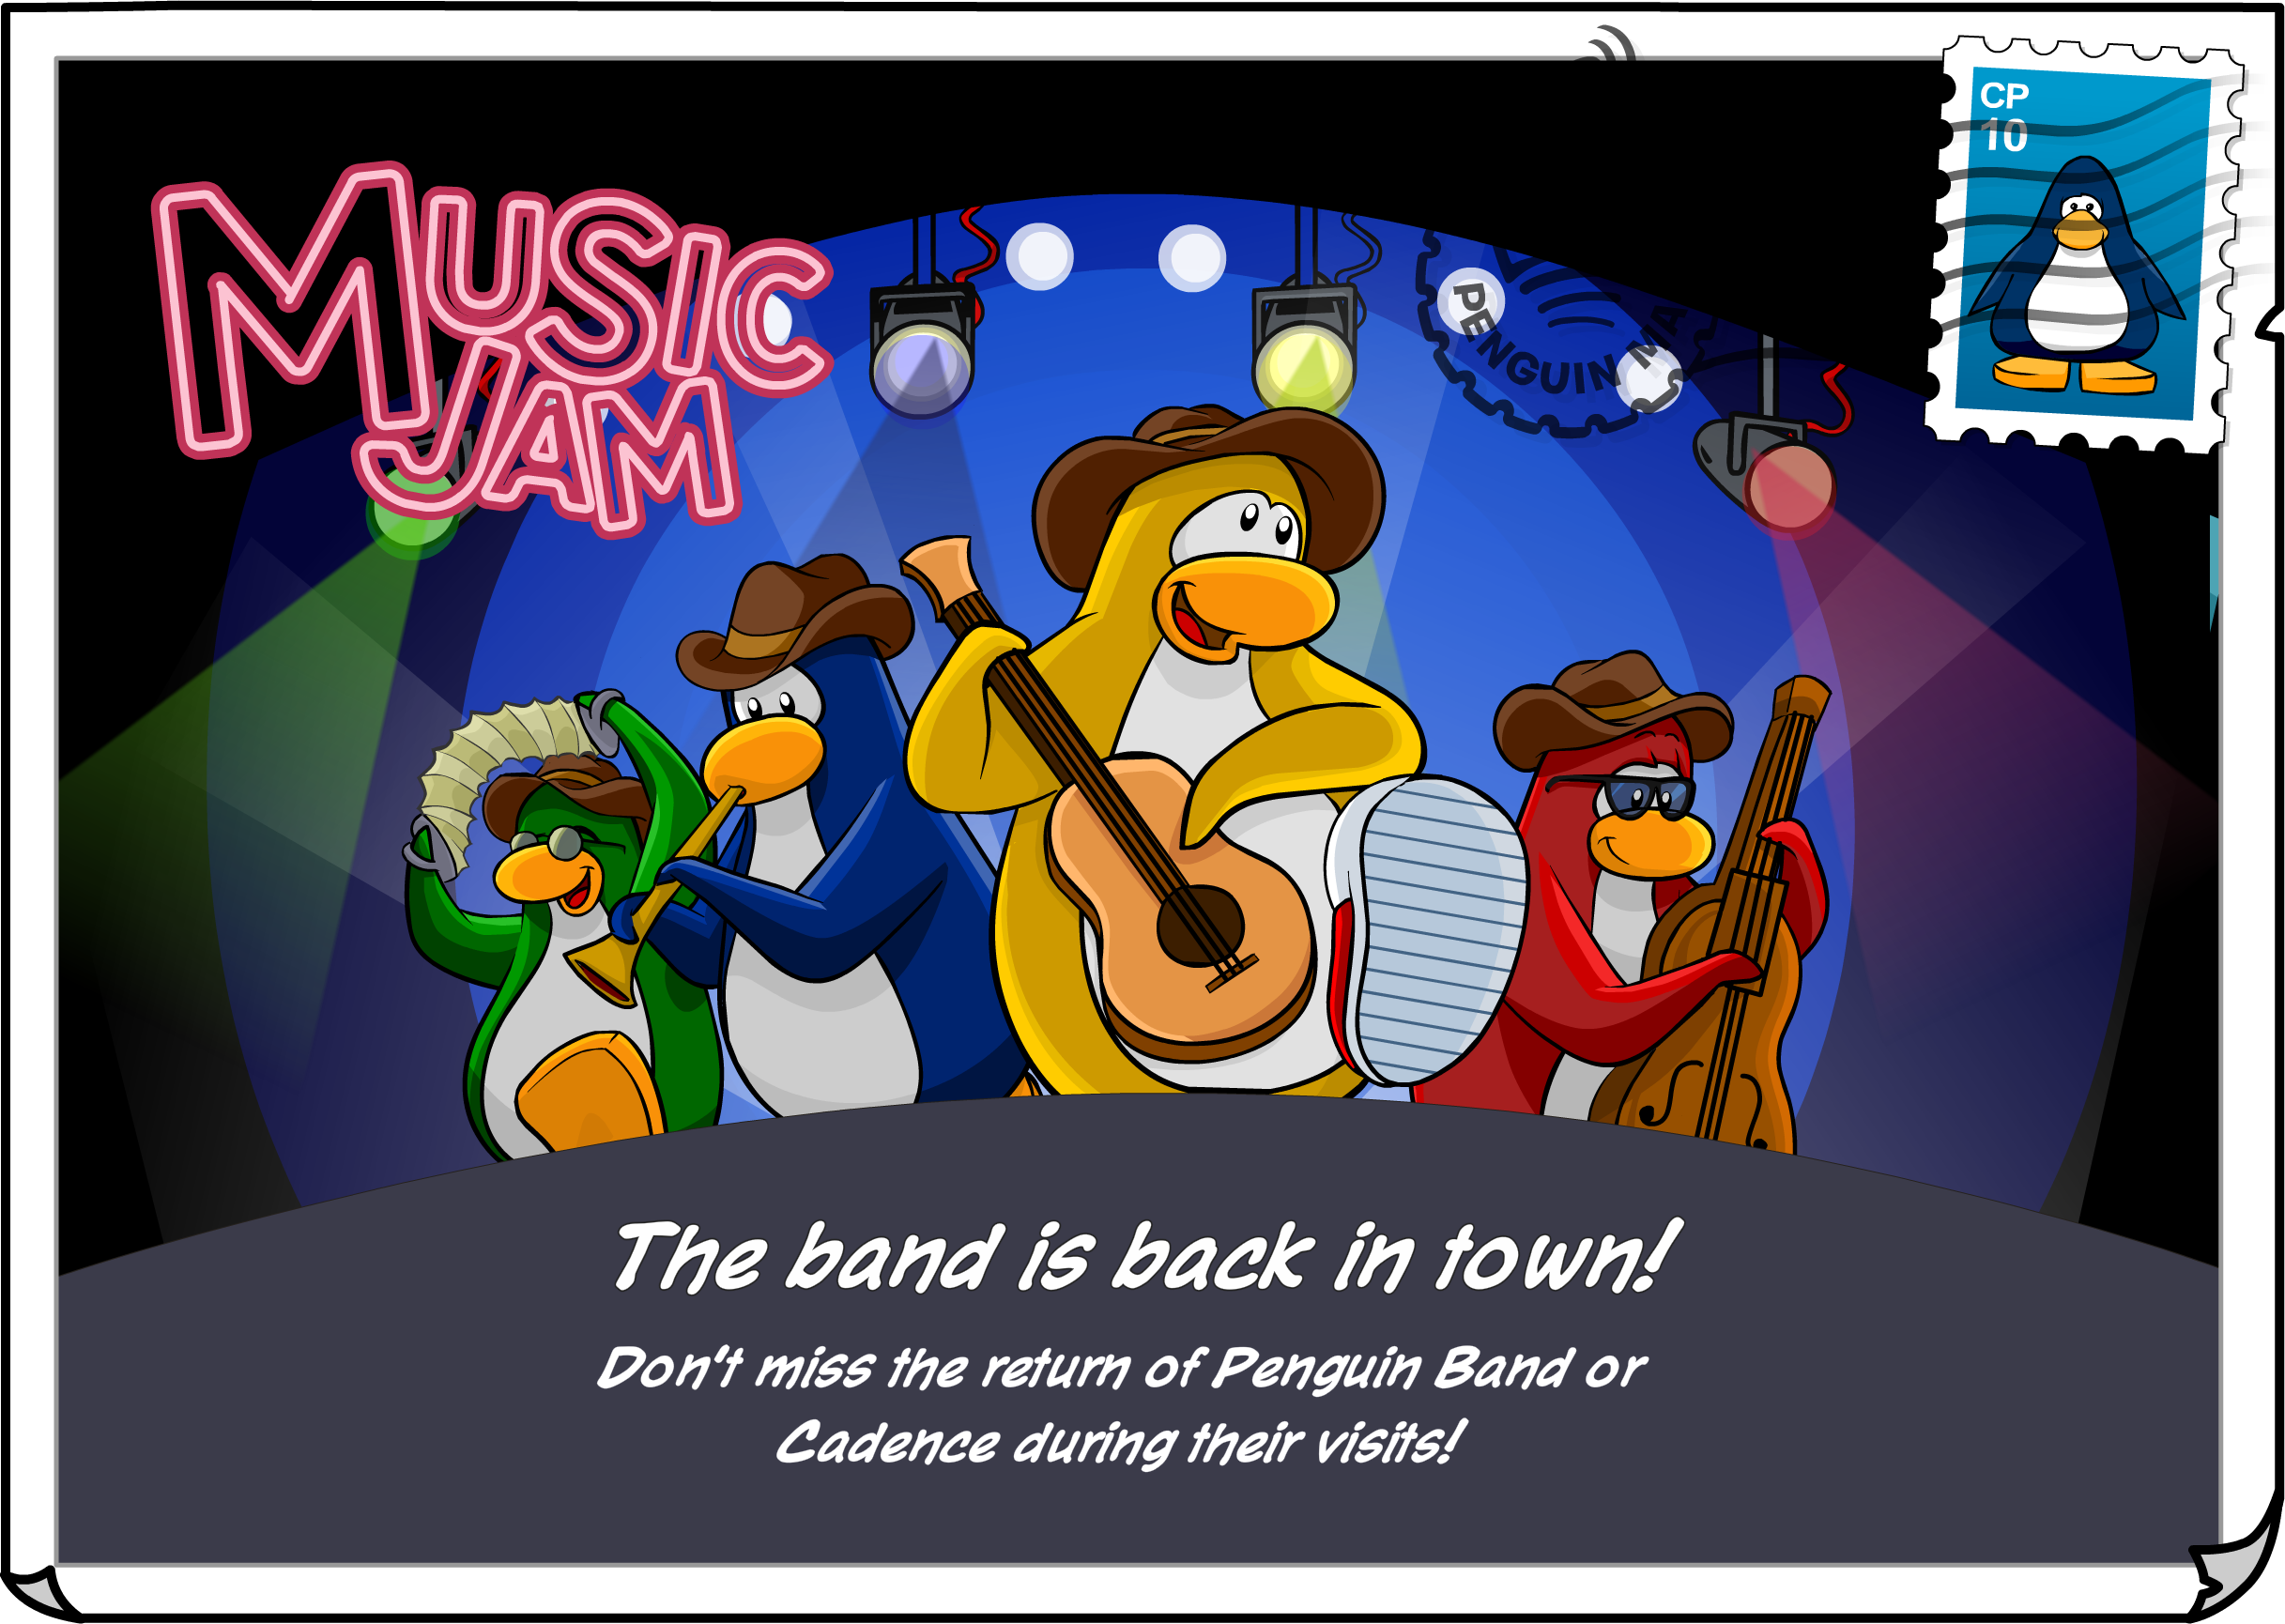 Music Jam 2020 Postcard